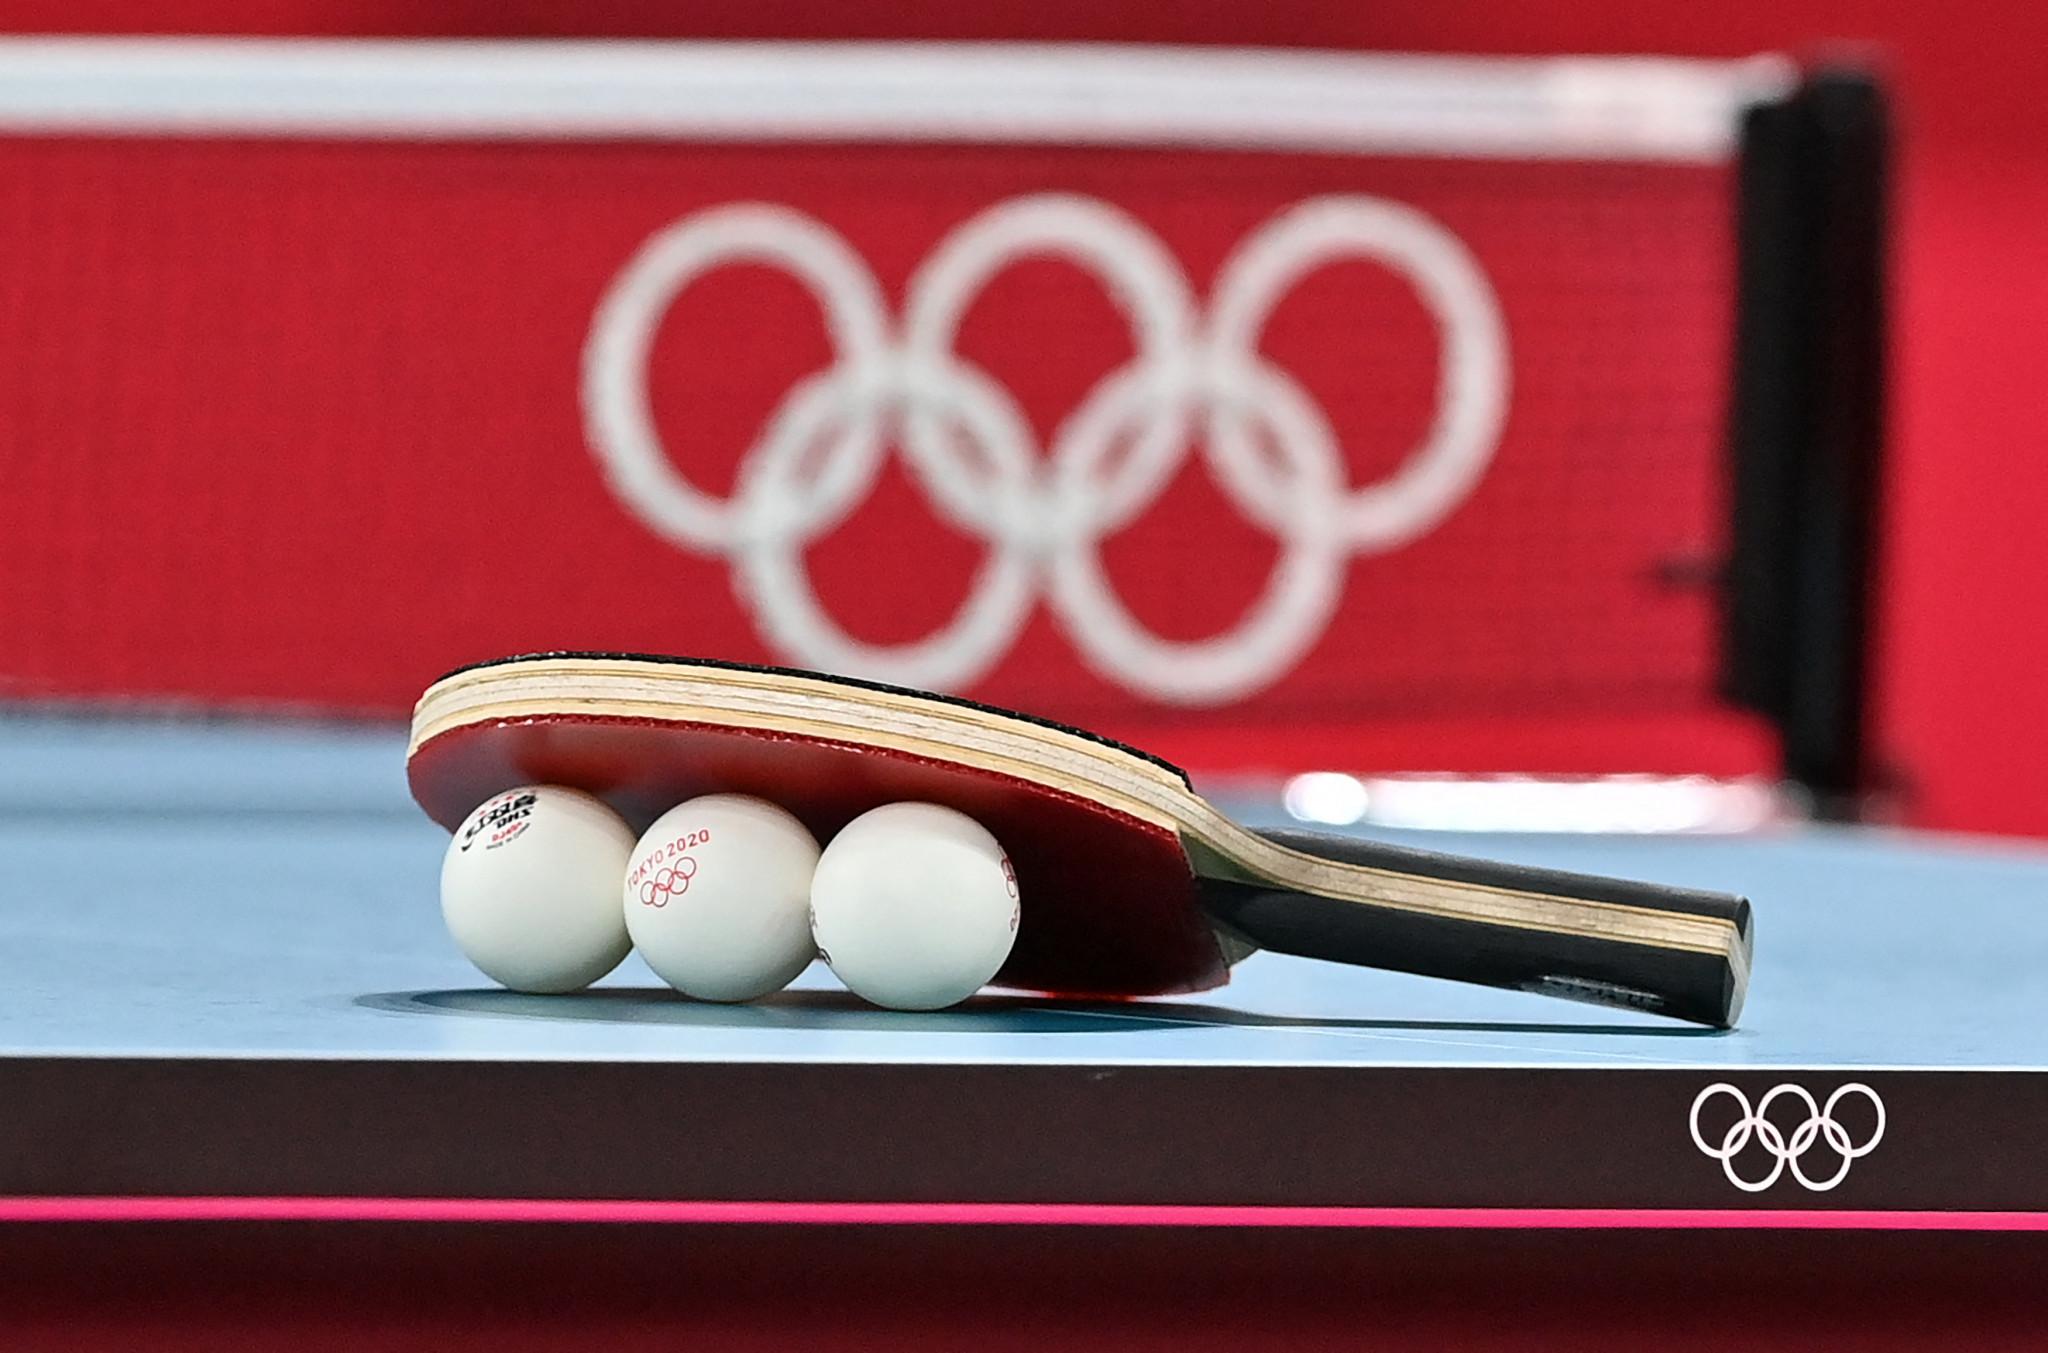 Russia beat Austria in thriller at European Table Tennis Team Championship